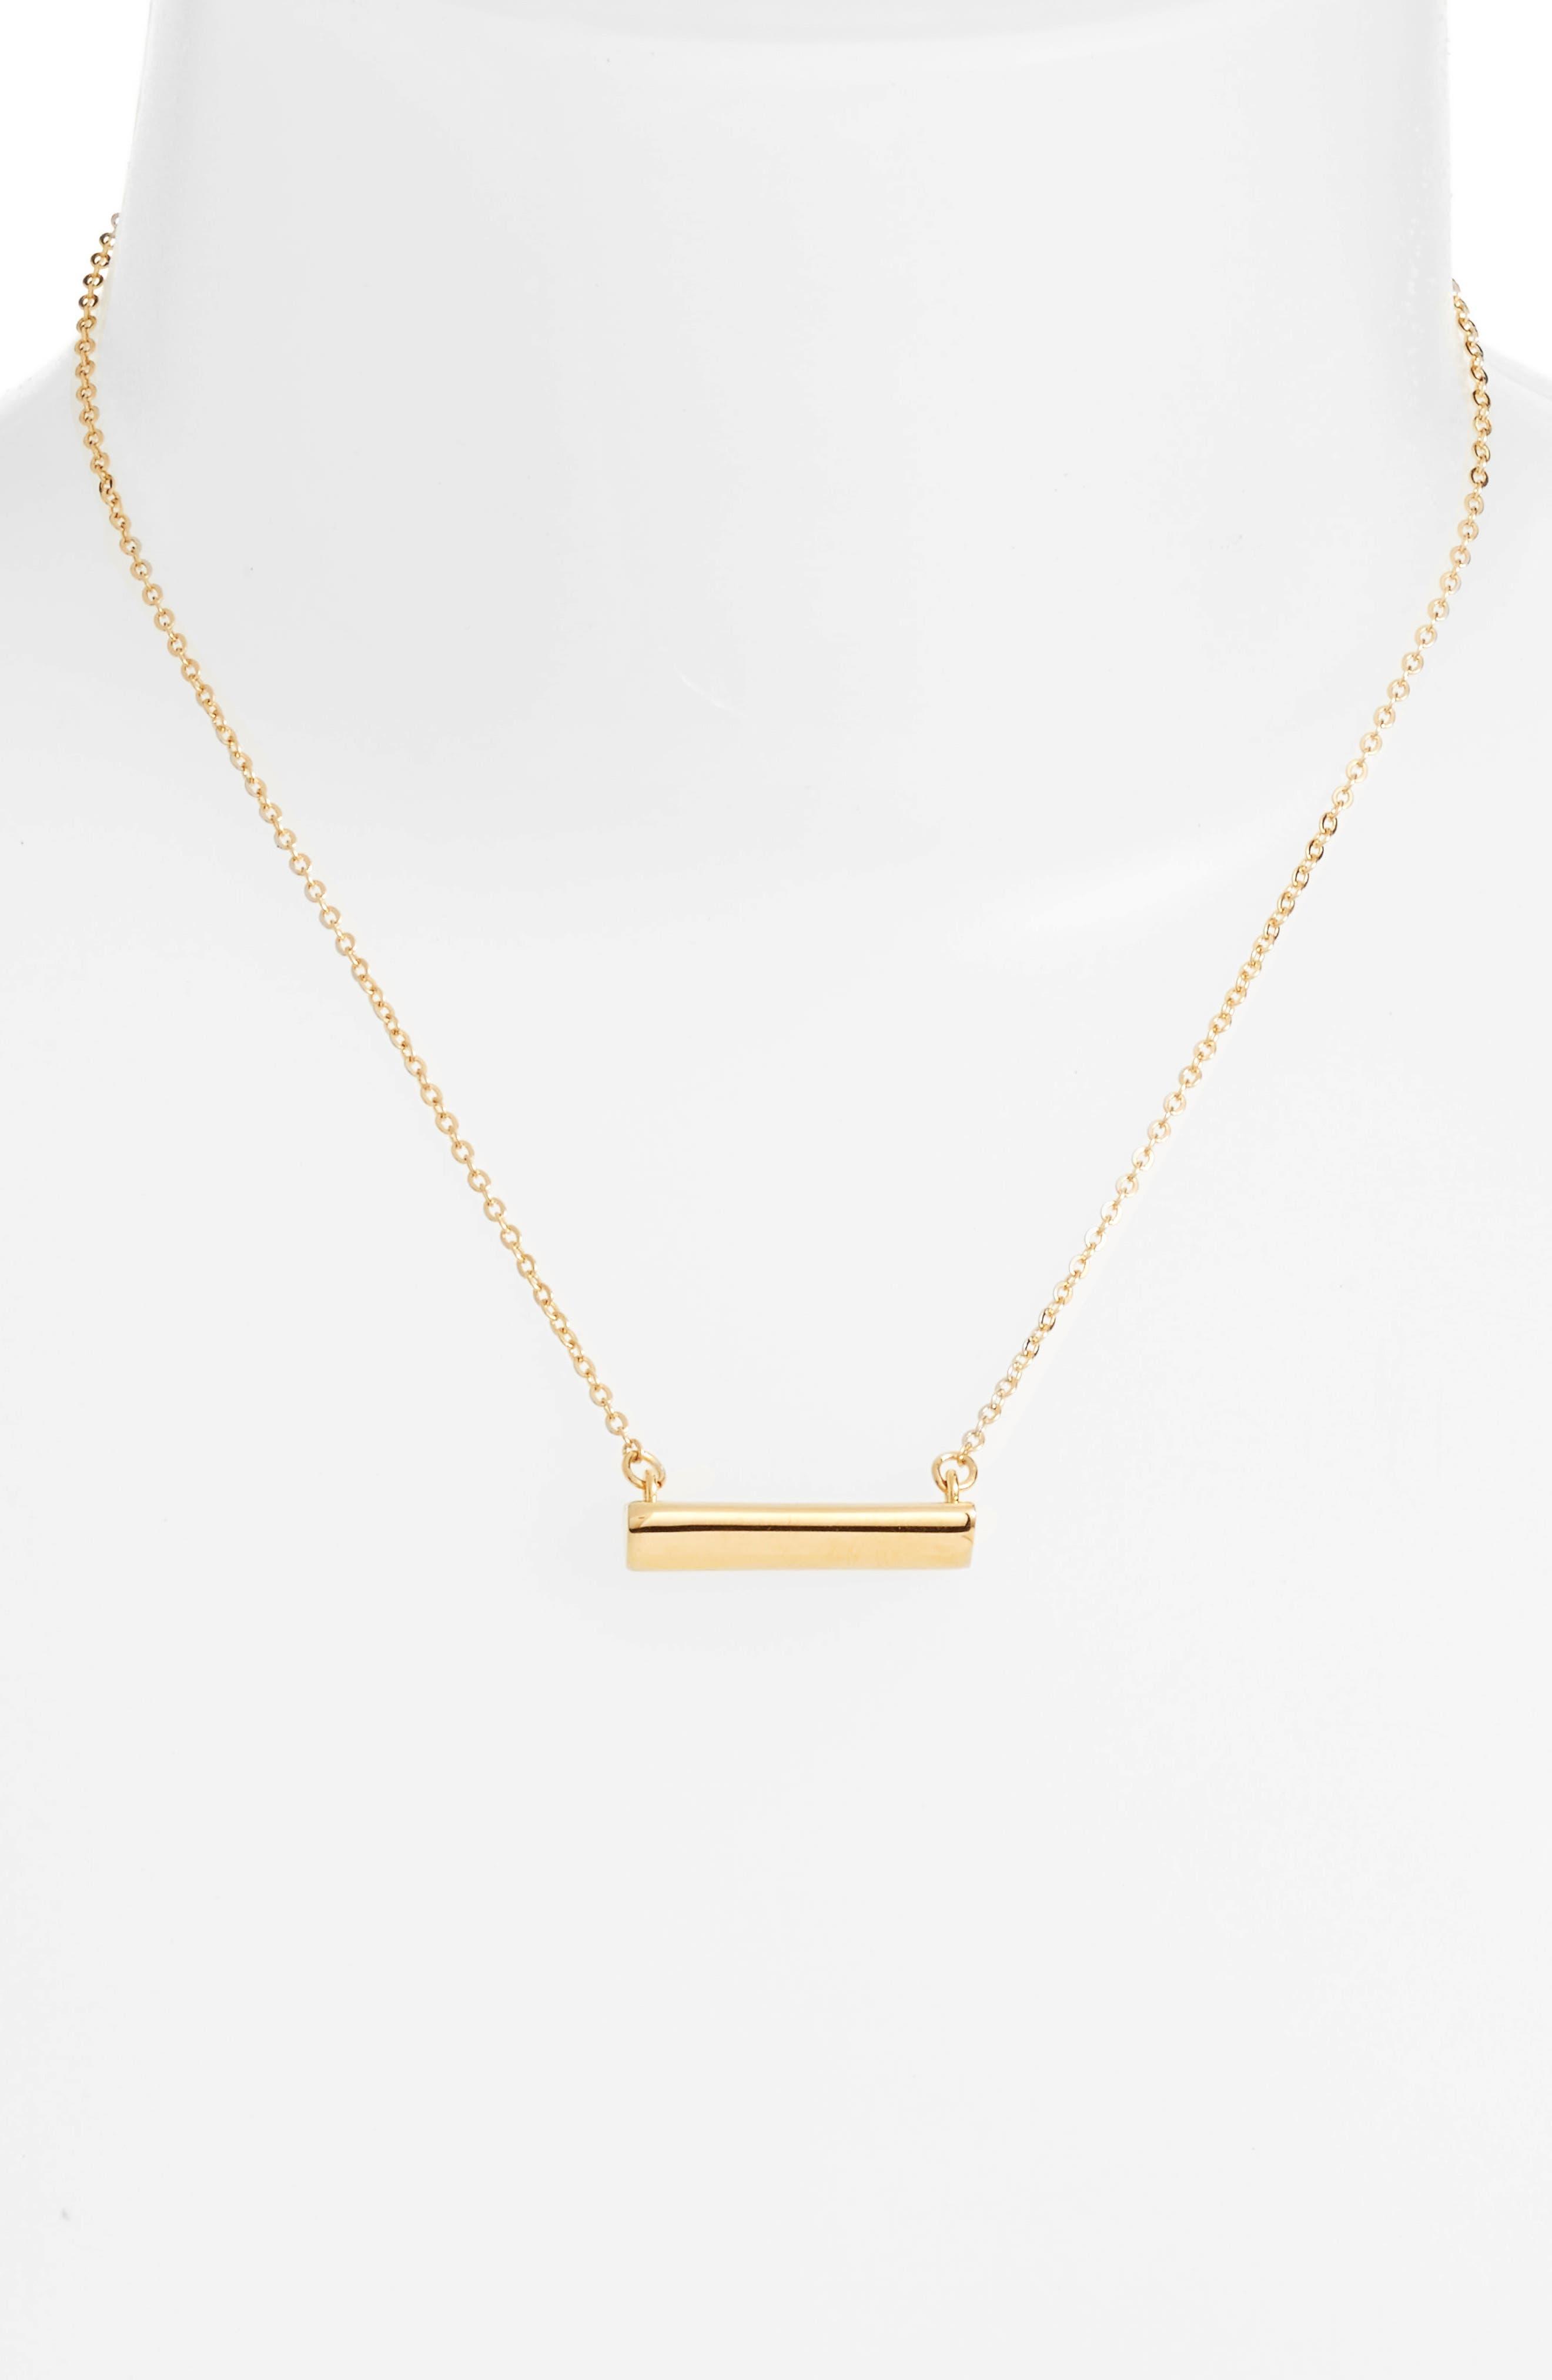 Heart Shaped Bar Pendant Necklace,                             Alternate thumbnail 2, color,                             Gold